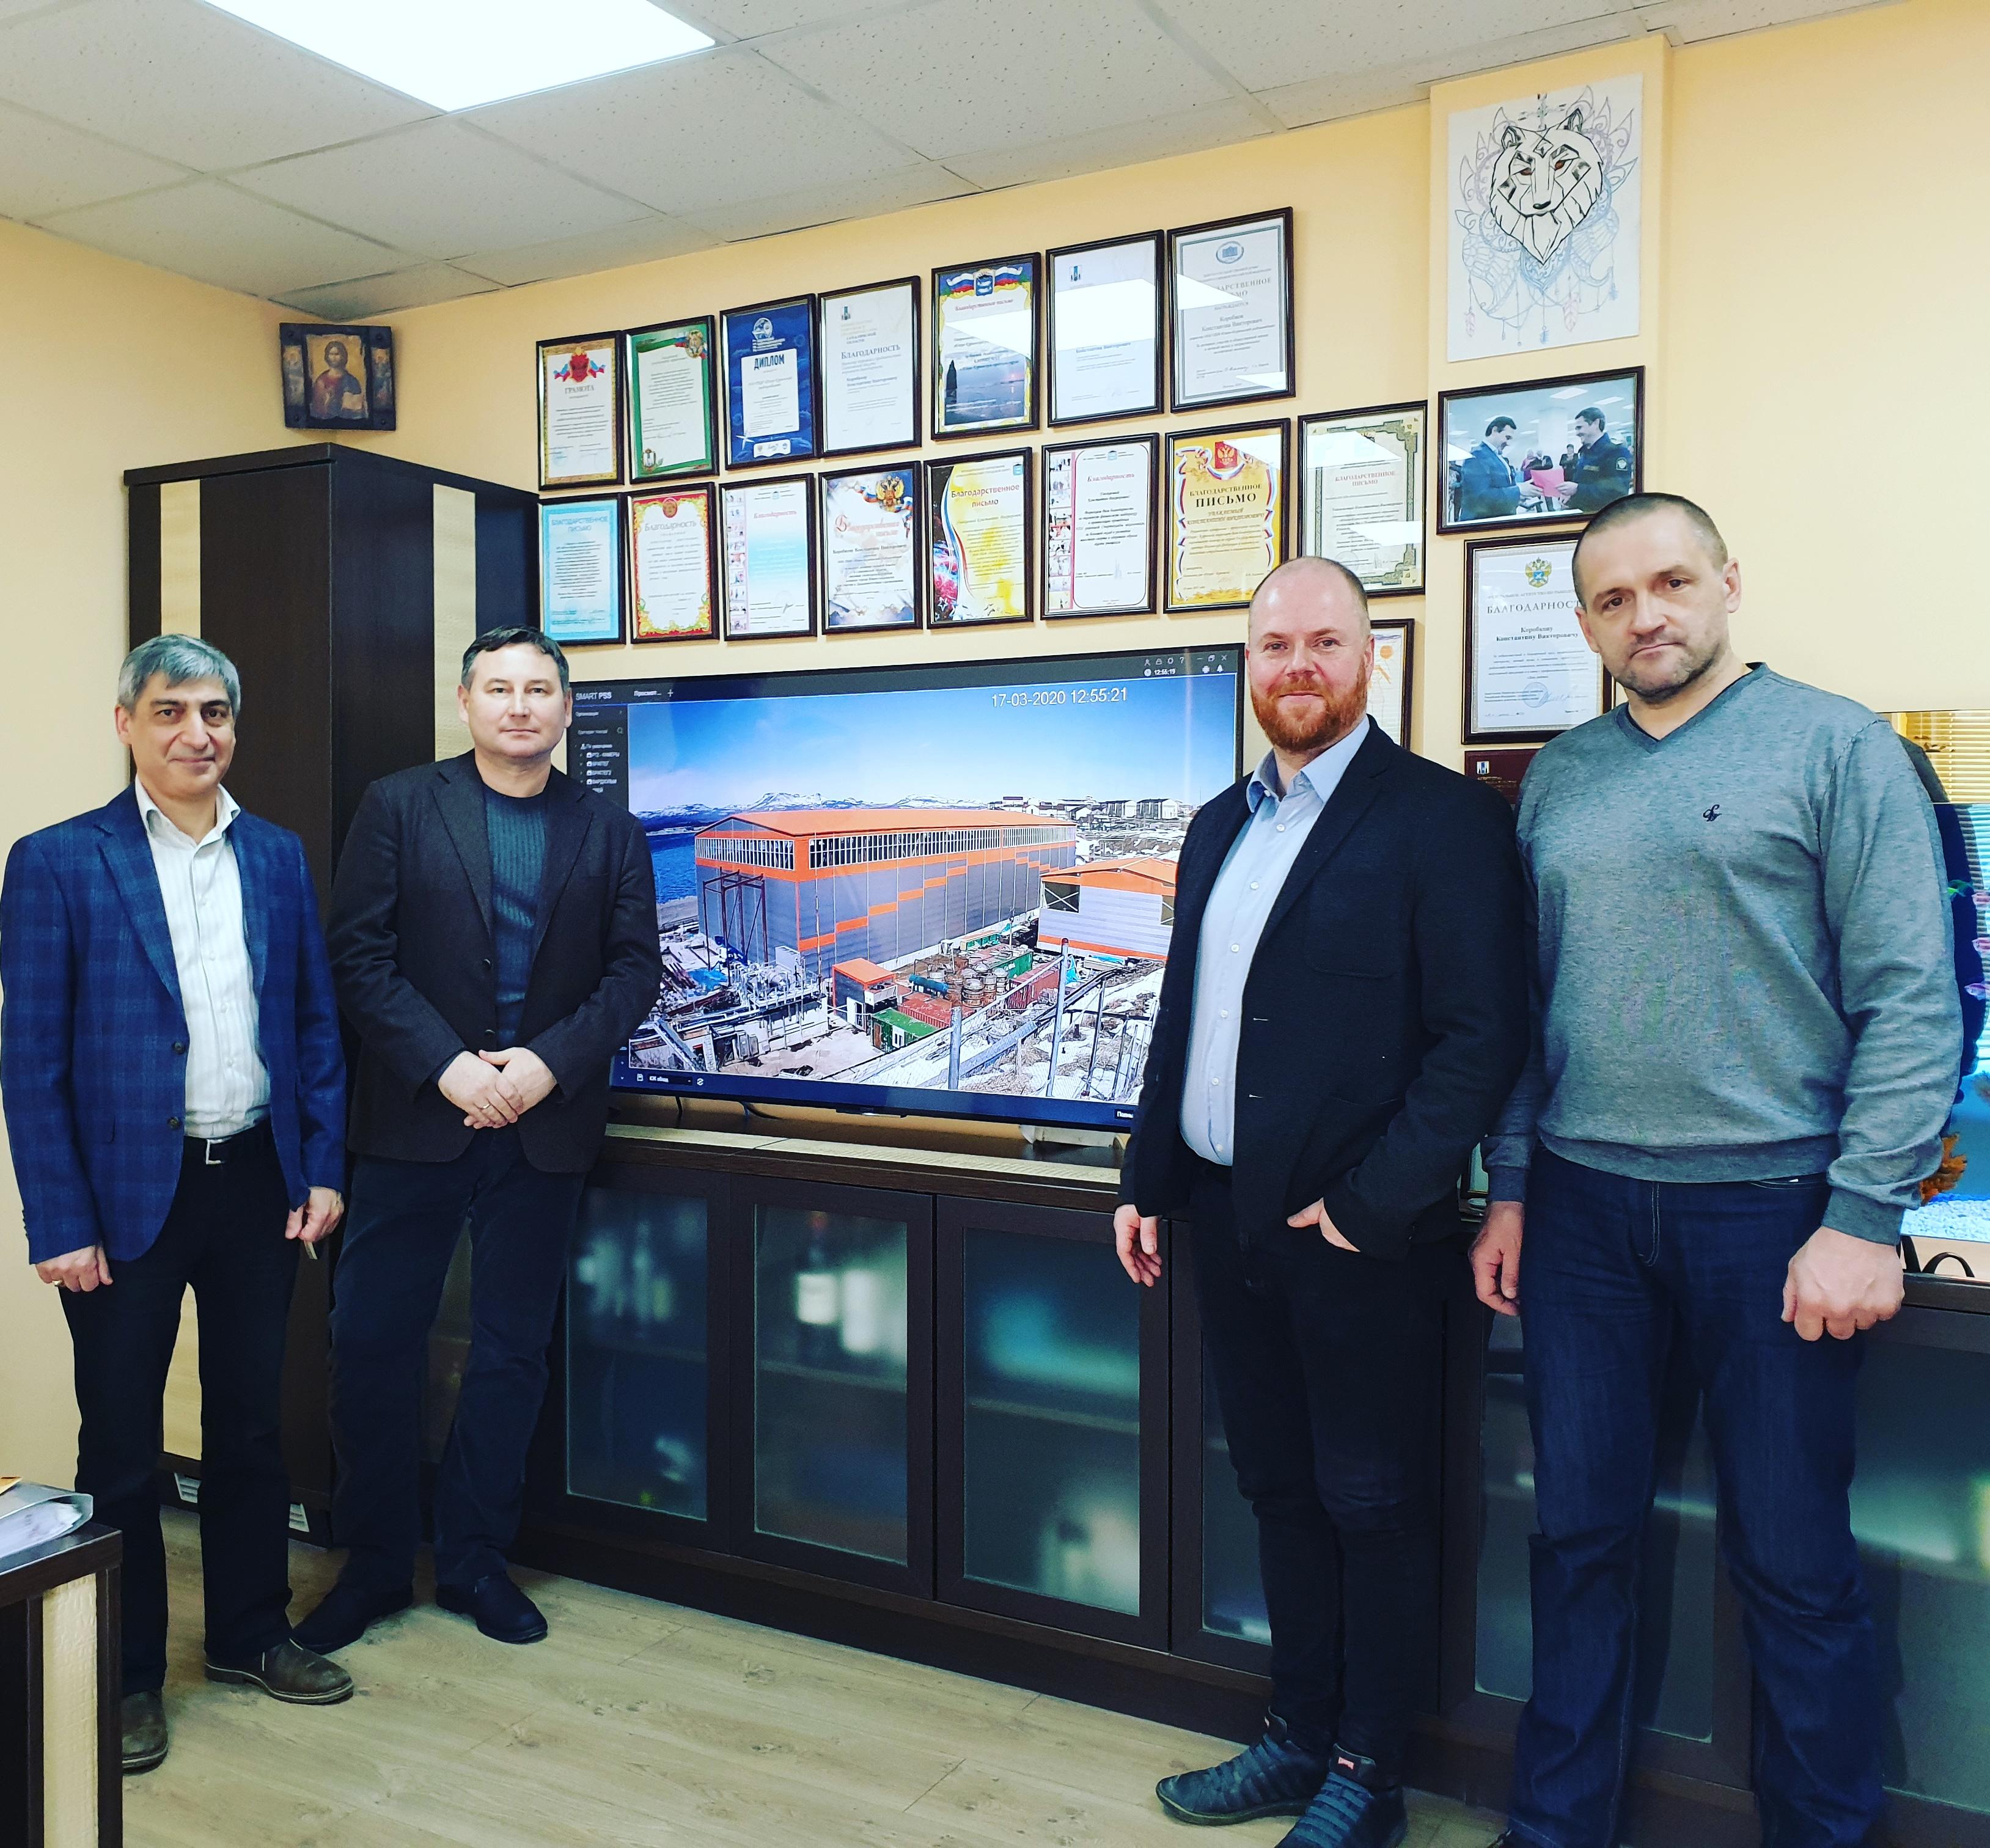 L to R Valeriy Akbashev, Konstantin Korobkov (owner of YKRK), Petur Pétursson , Vladimir Borodkin (Chief Production)